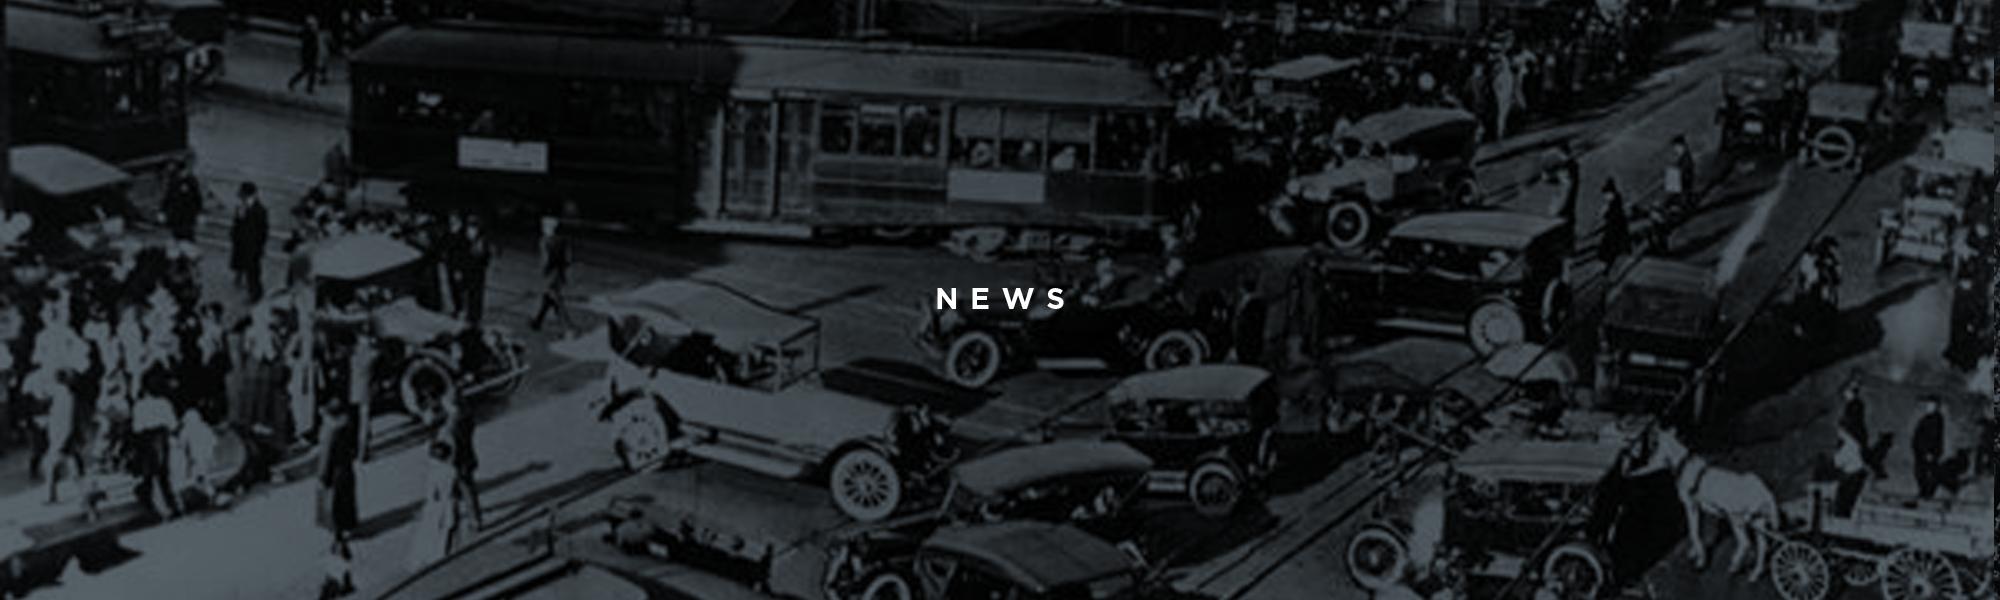 MVBA_Headers_News